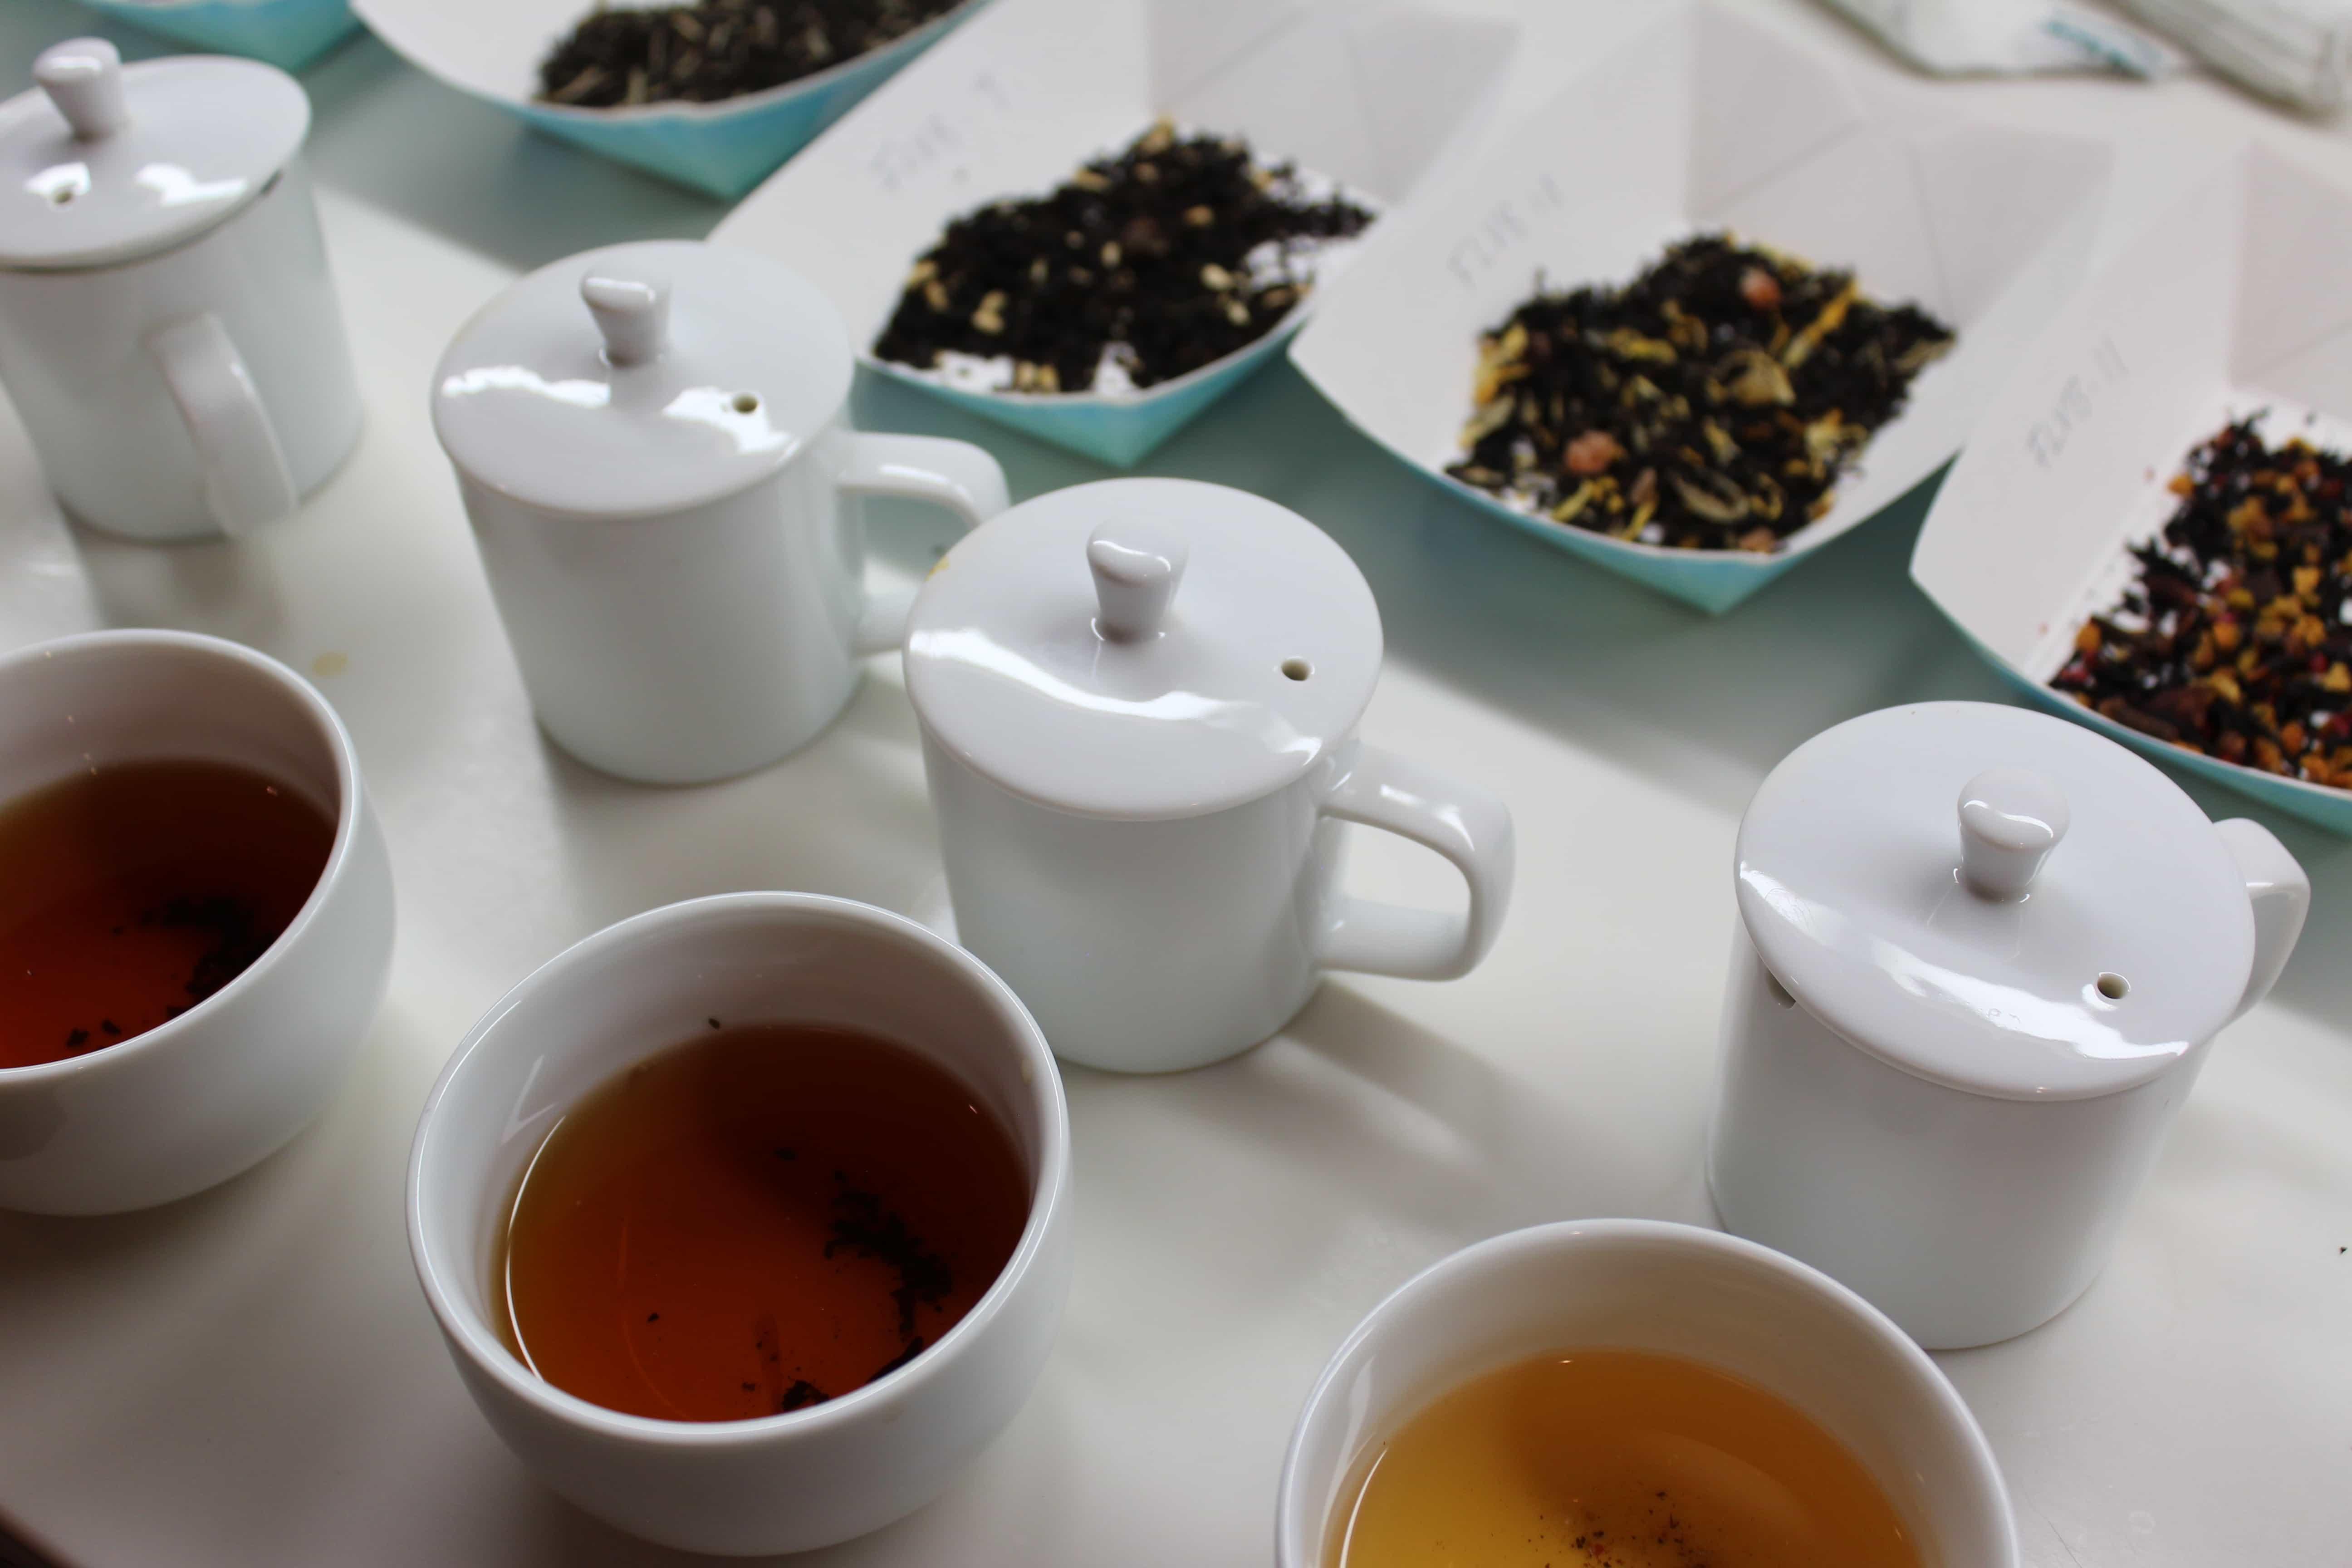 Aaron Kiel 25 IMG 6691 - Global Tea Championship Announces Winners of the Fall Hot Tea, Packaged Single-Service Tea Evaluations